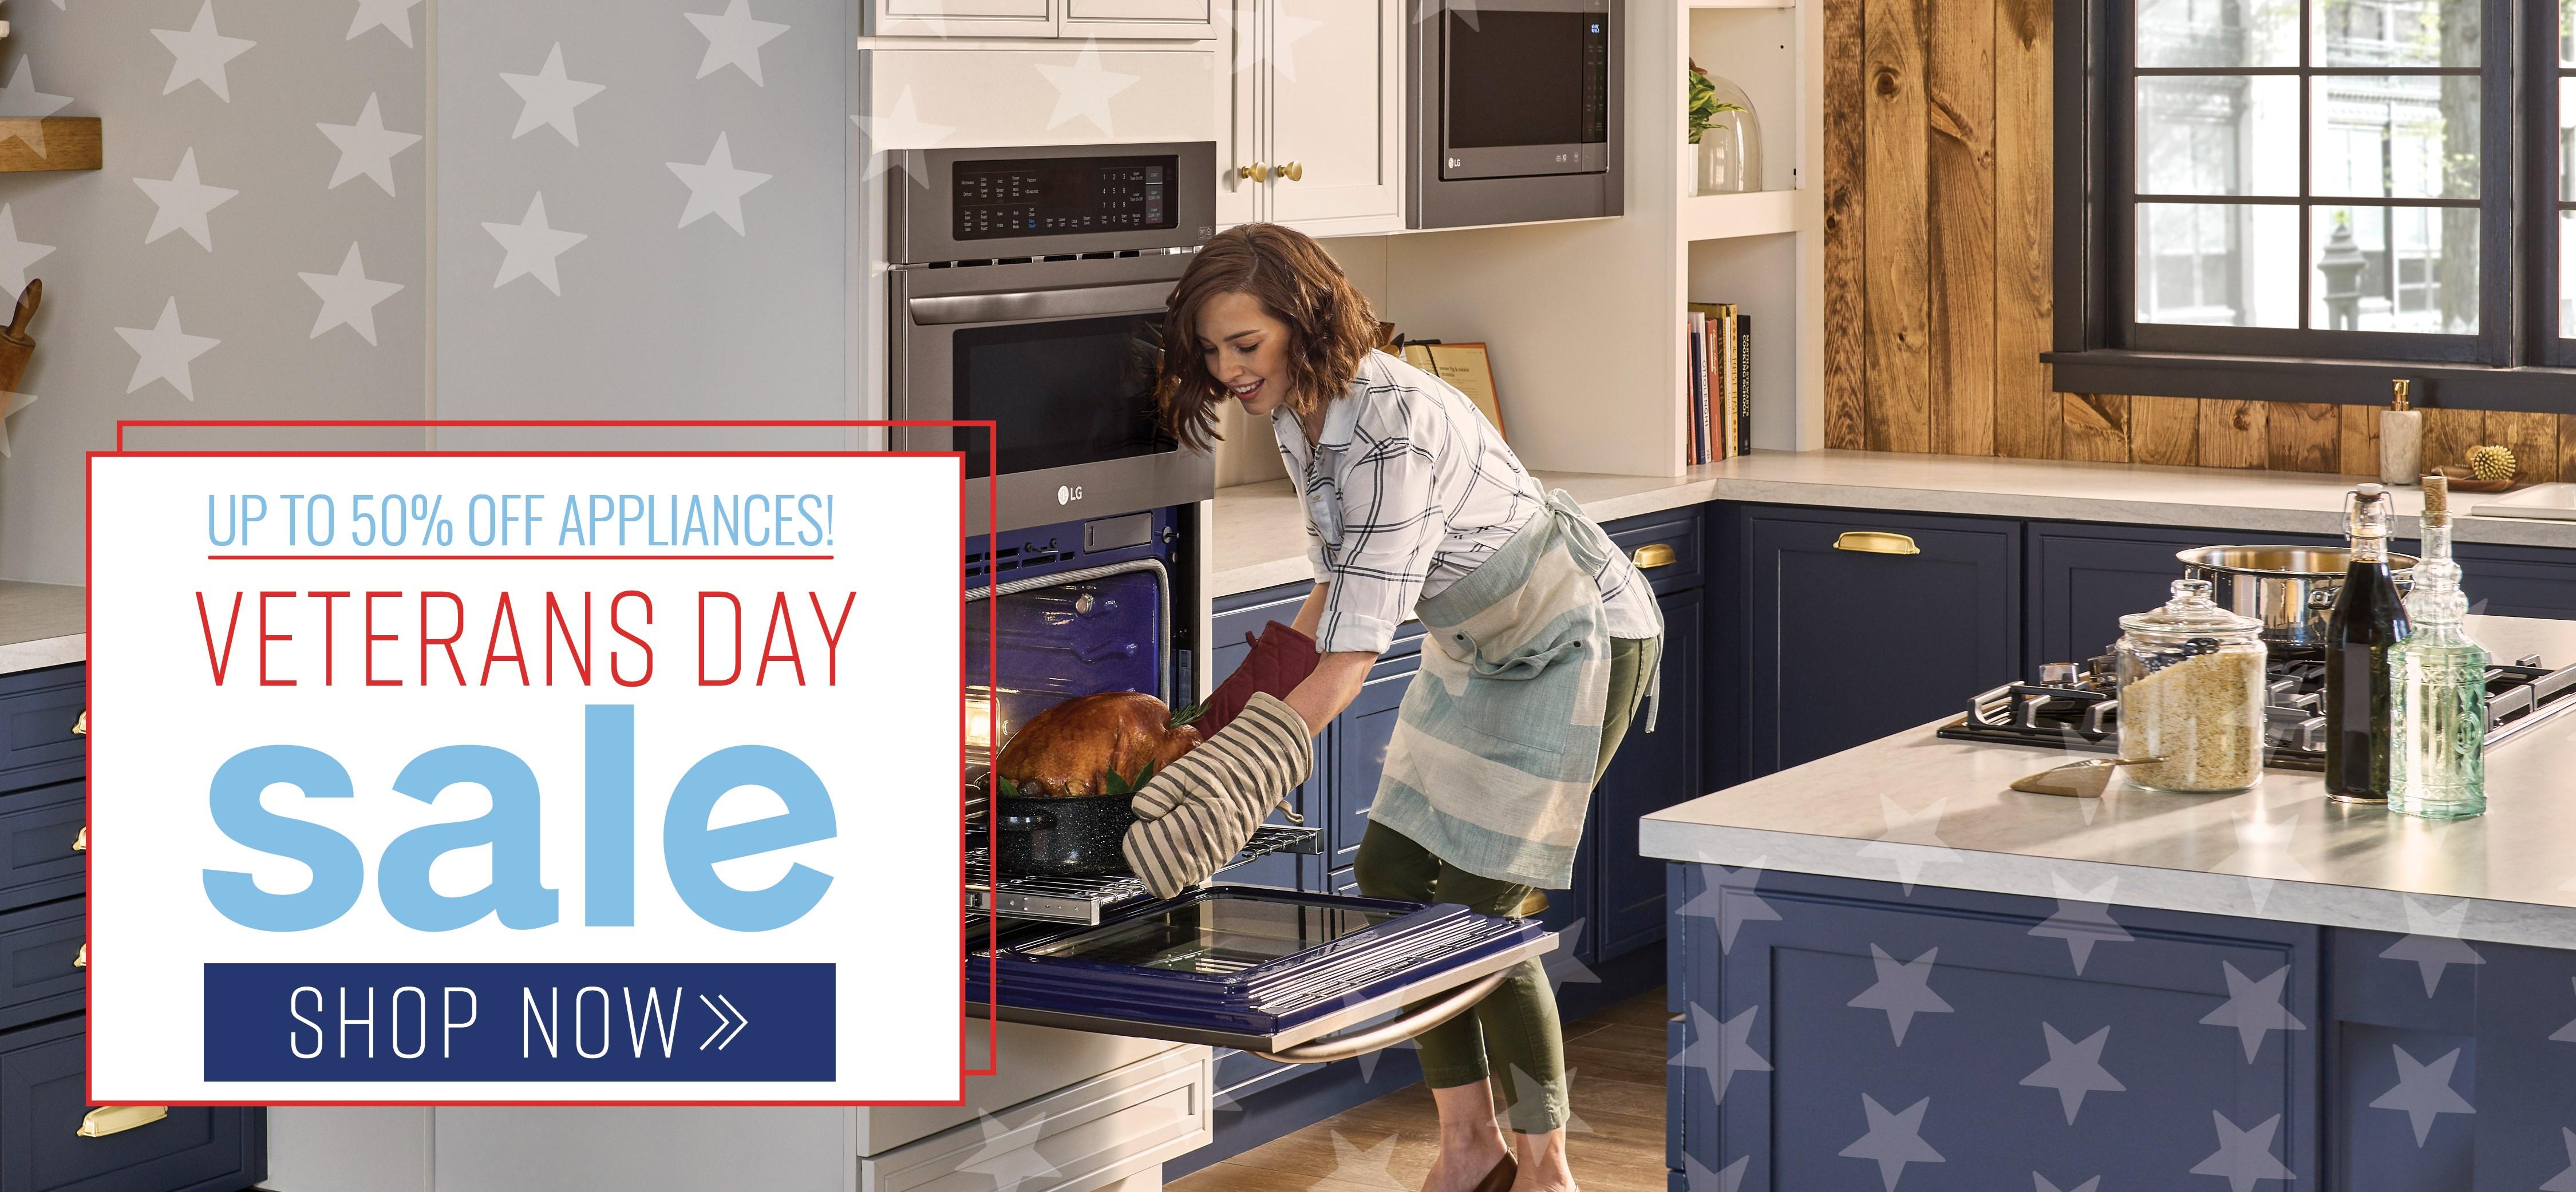 Furniture & ApplianceMart Veterans Day Sale